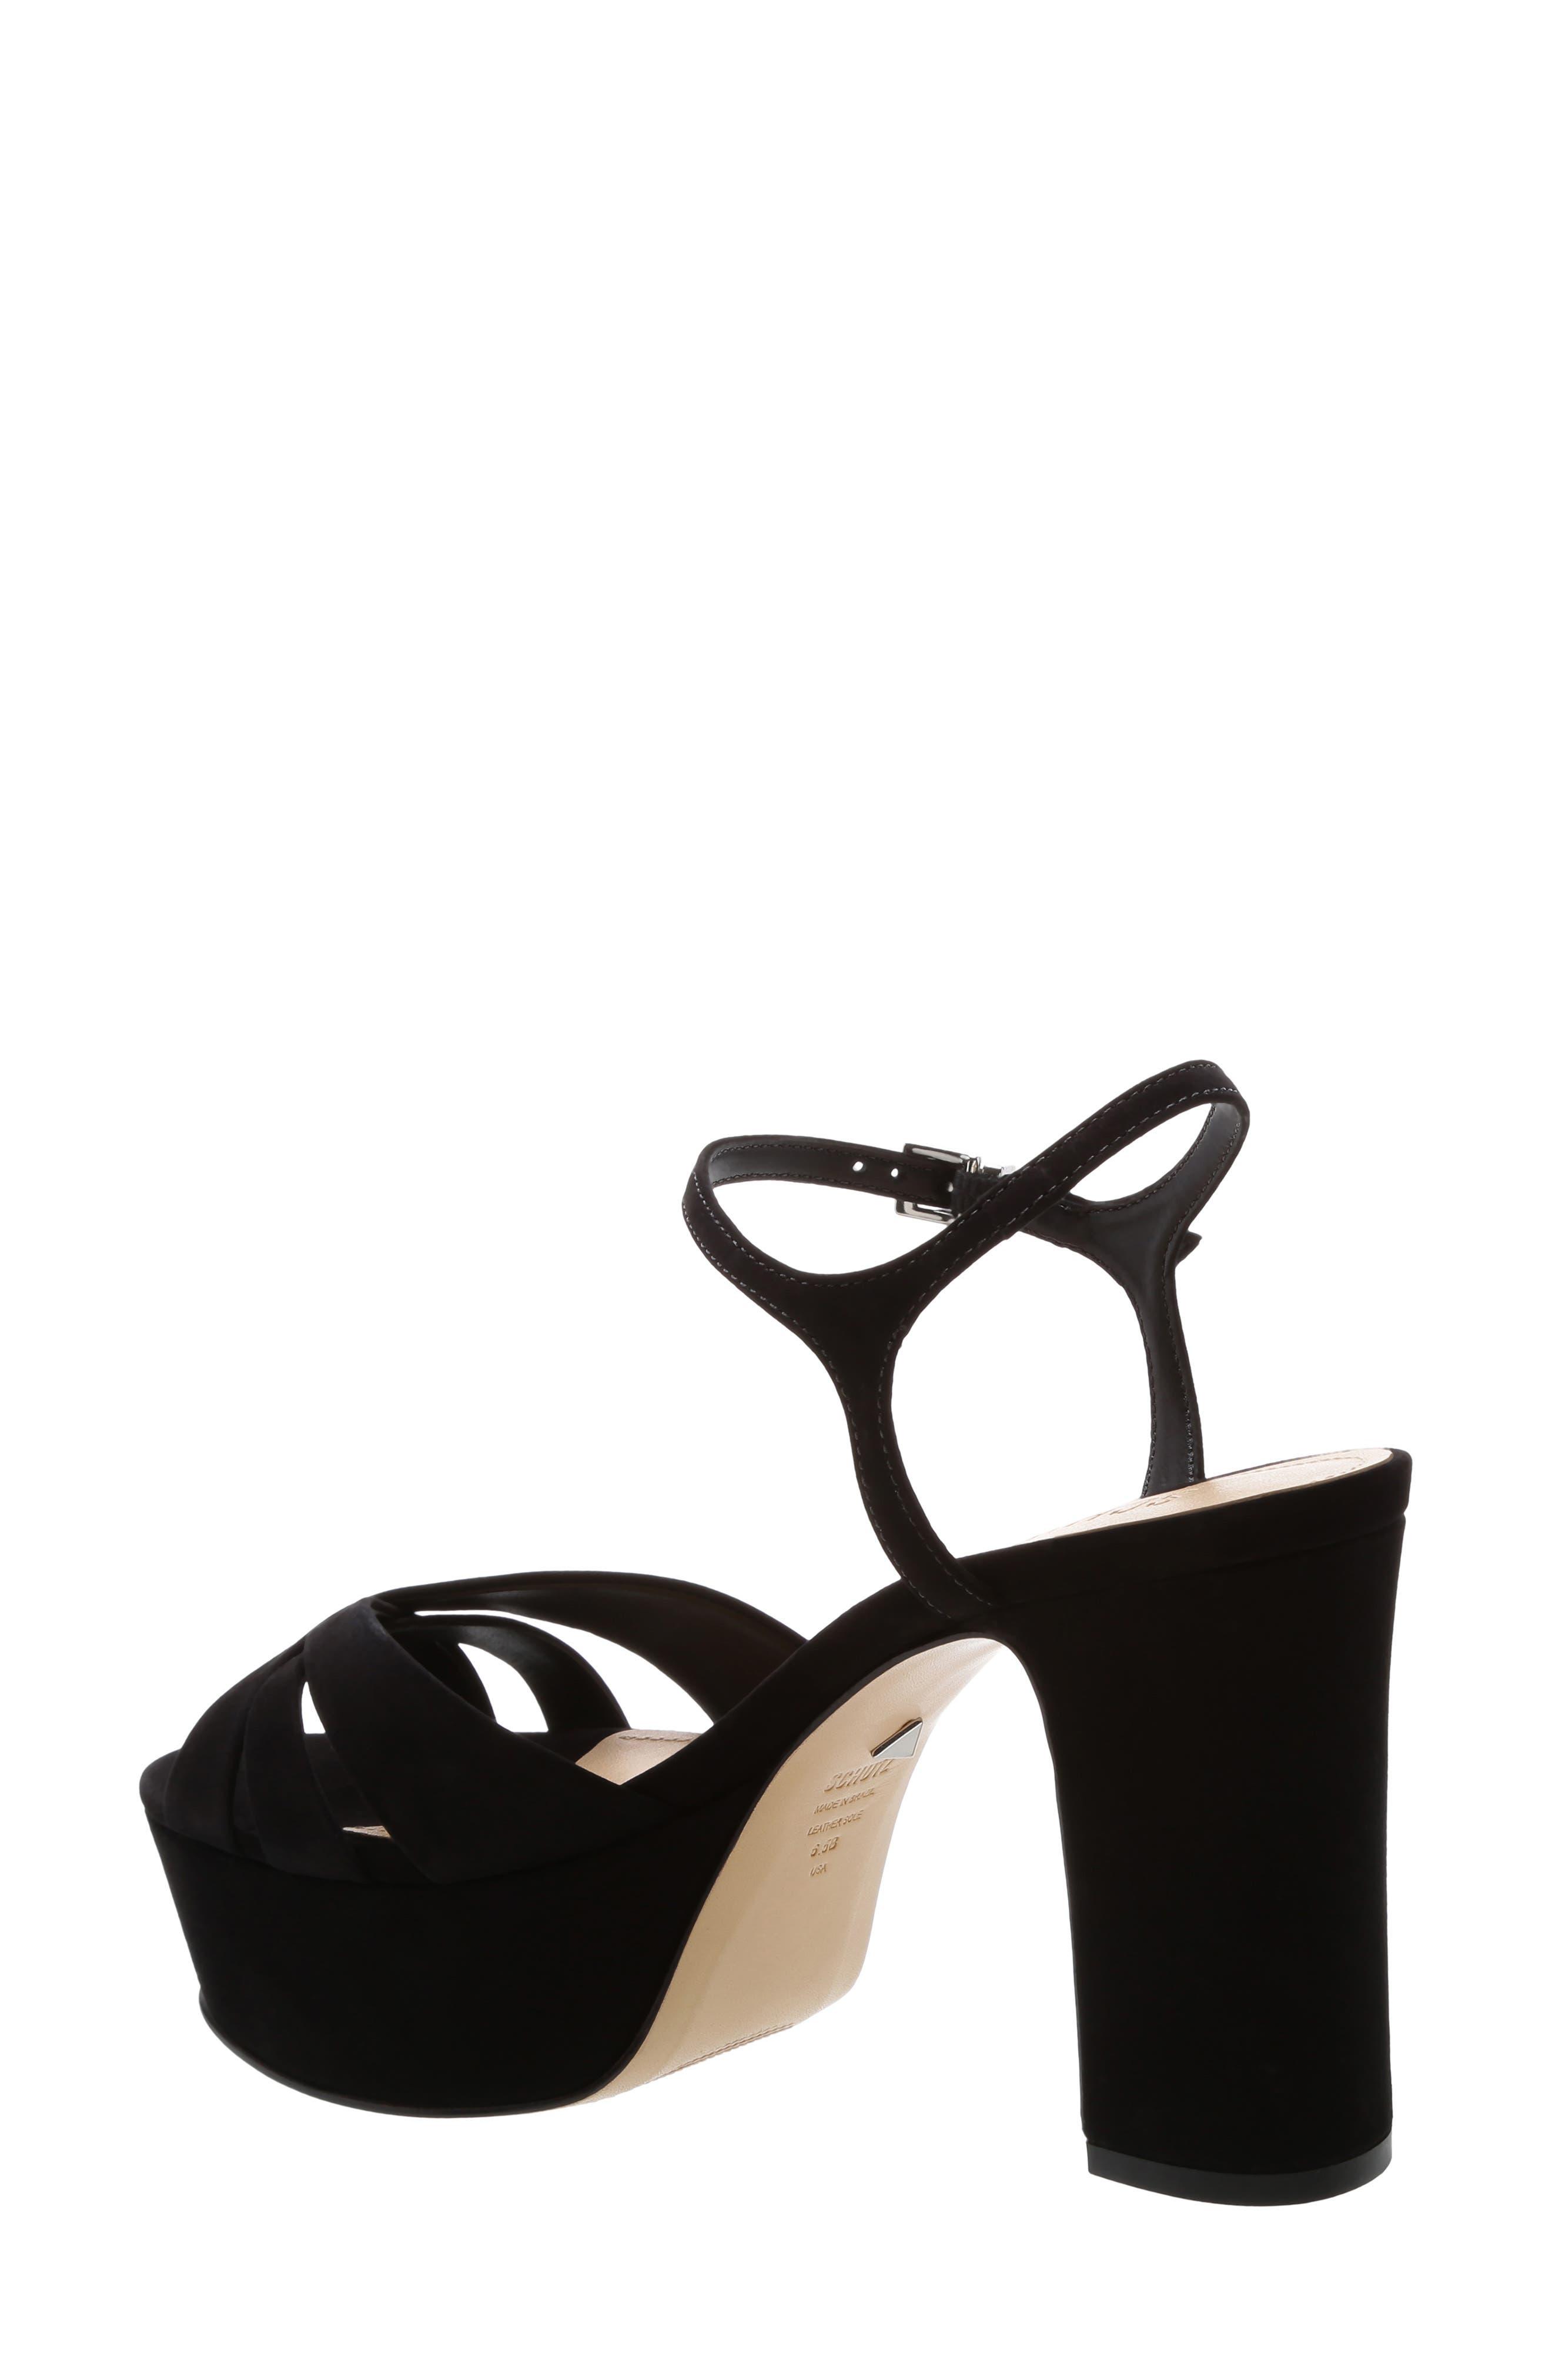 SCHUTZ, Keefa Platform Sandal, Alternate thumbnail 2, color, BLACK NUBUCK LEATHER